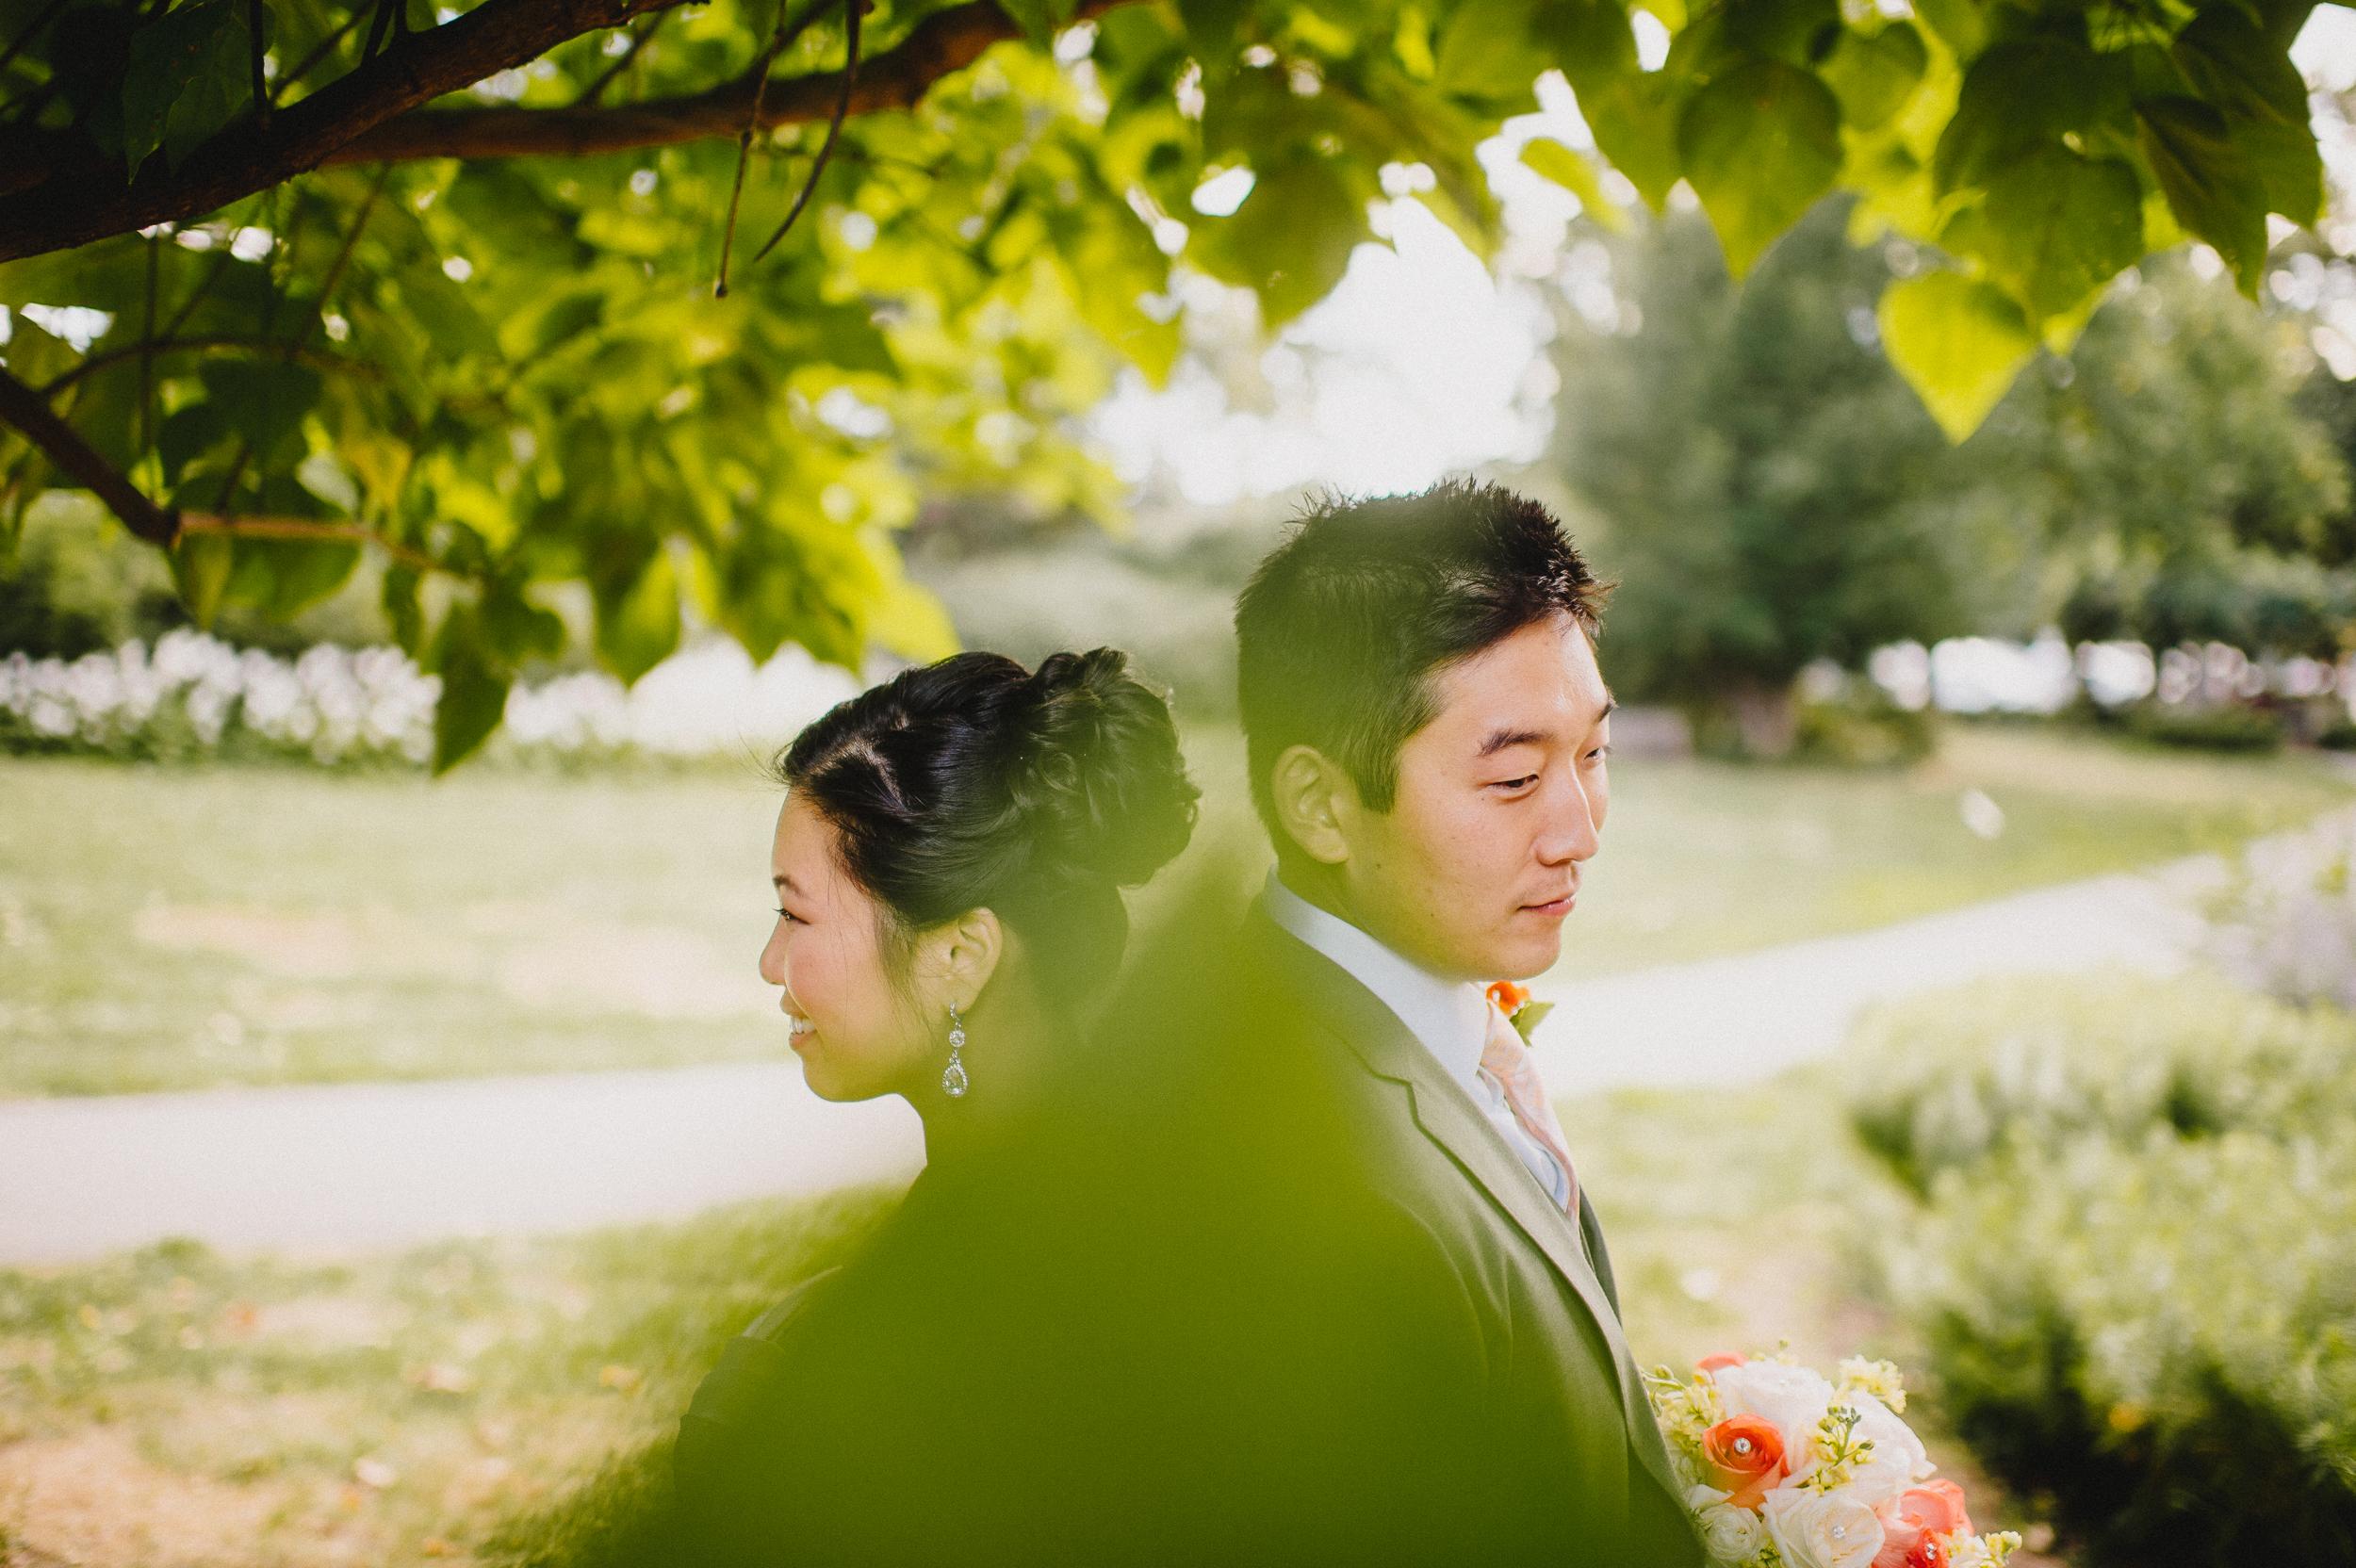 union-trust-philadelphia-wedding-photographer-55.jpg